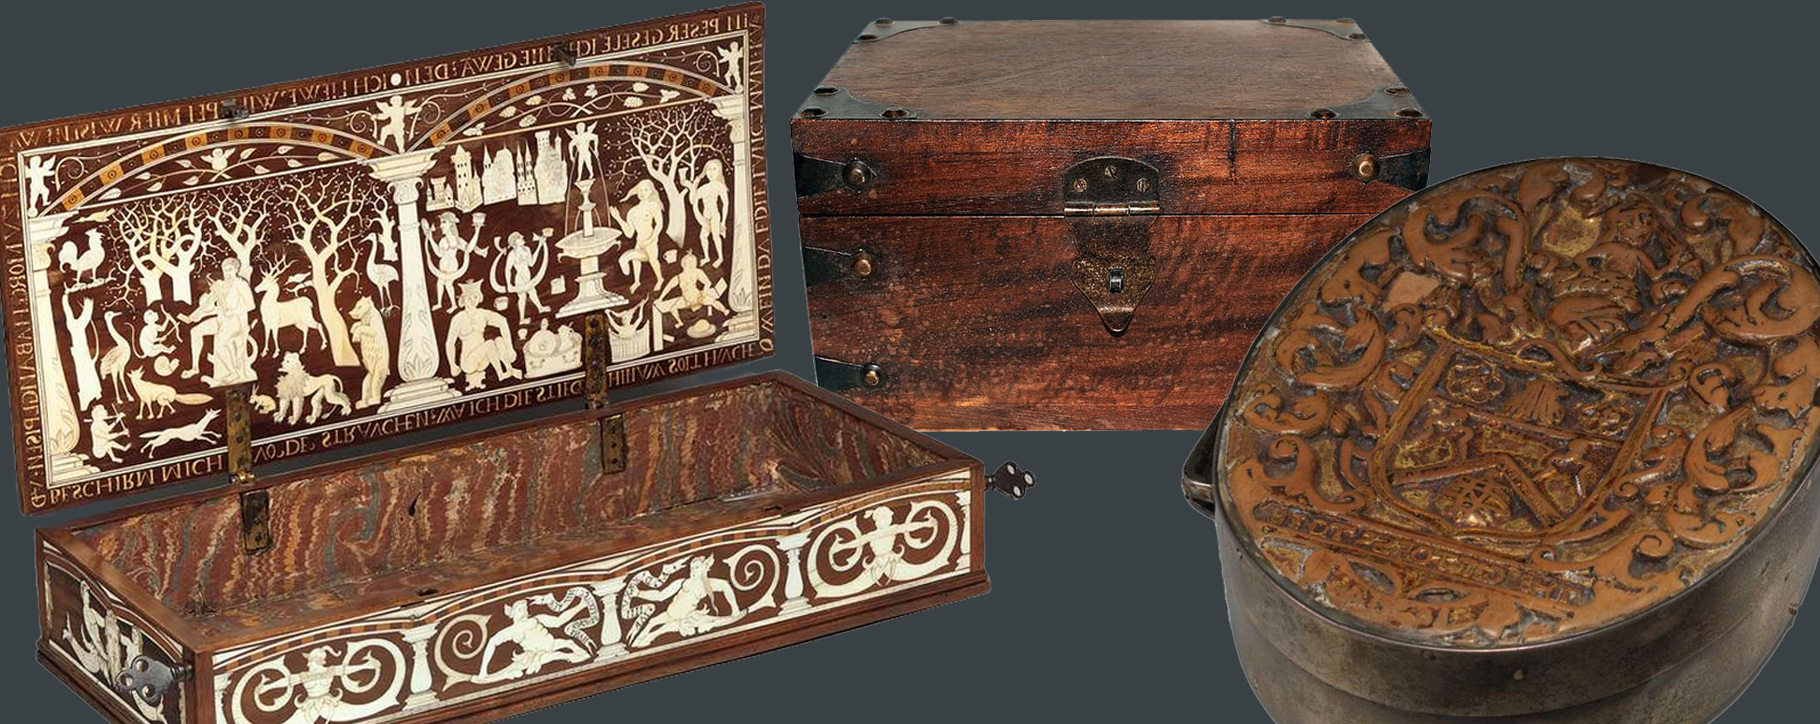 Wooden Box Restoration